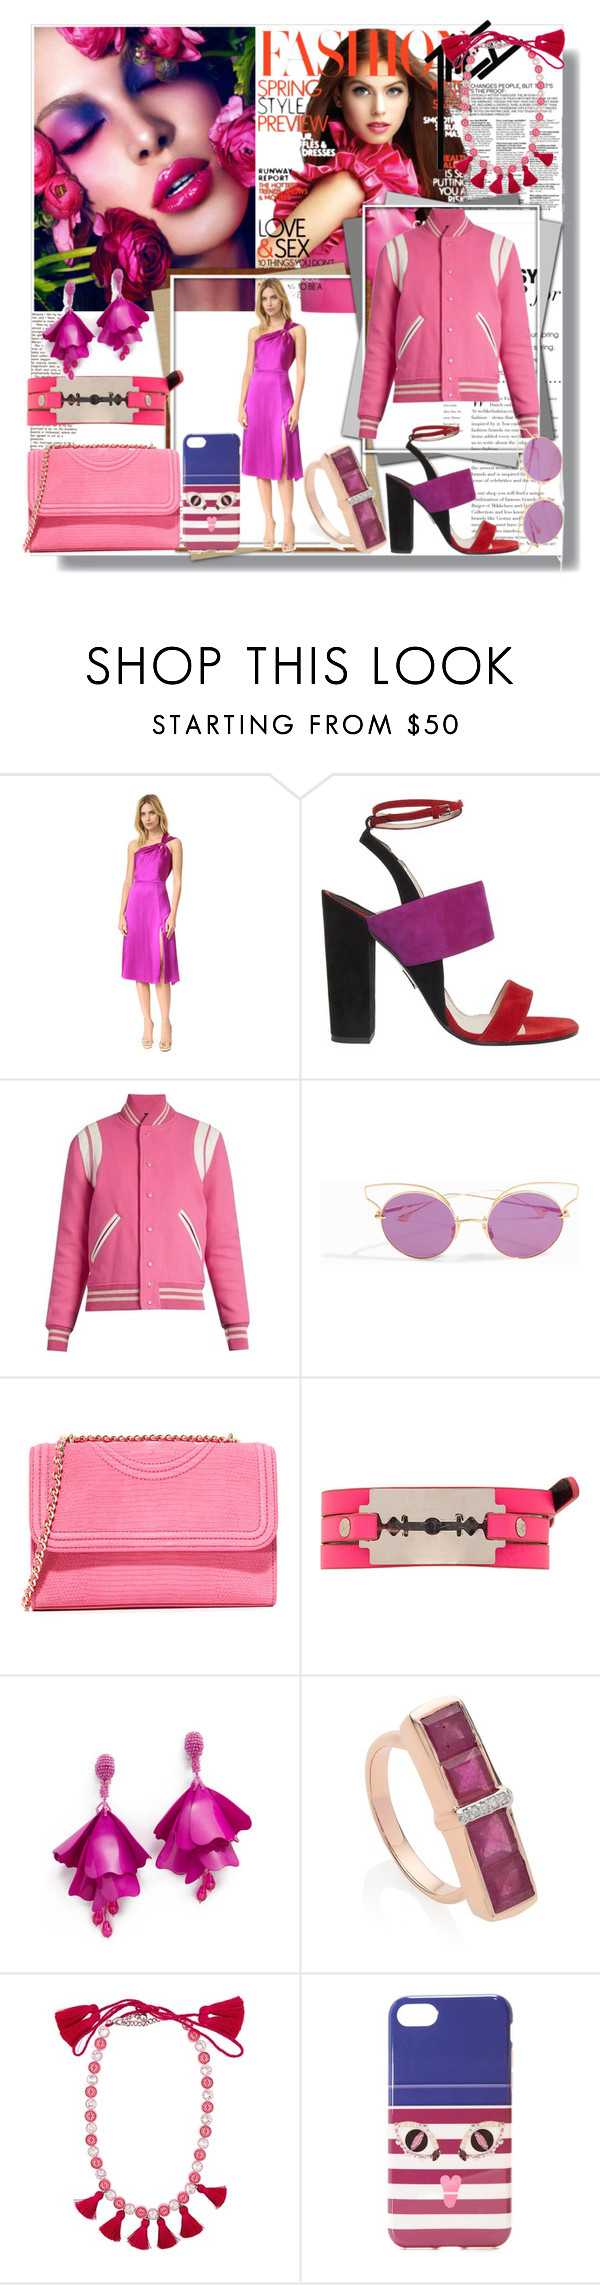 """Season's Hottest Pink Look!!"" by stylediva20 ❤ liked on Polyvore featuring Cushnie Et Ochs, Paul Andrew, Yves Saint Laurent, Dita, Tory Burch, McQ by Alexander McQueen, Oscar de la Renta, Monica Vinader, Shourouk and Iphoria"